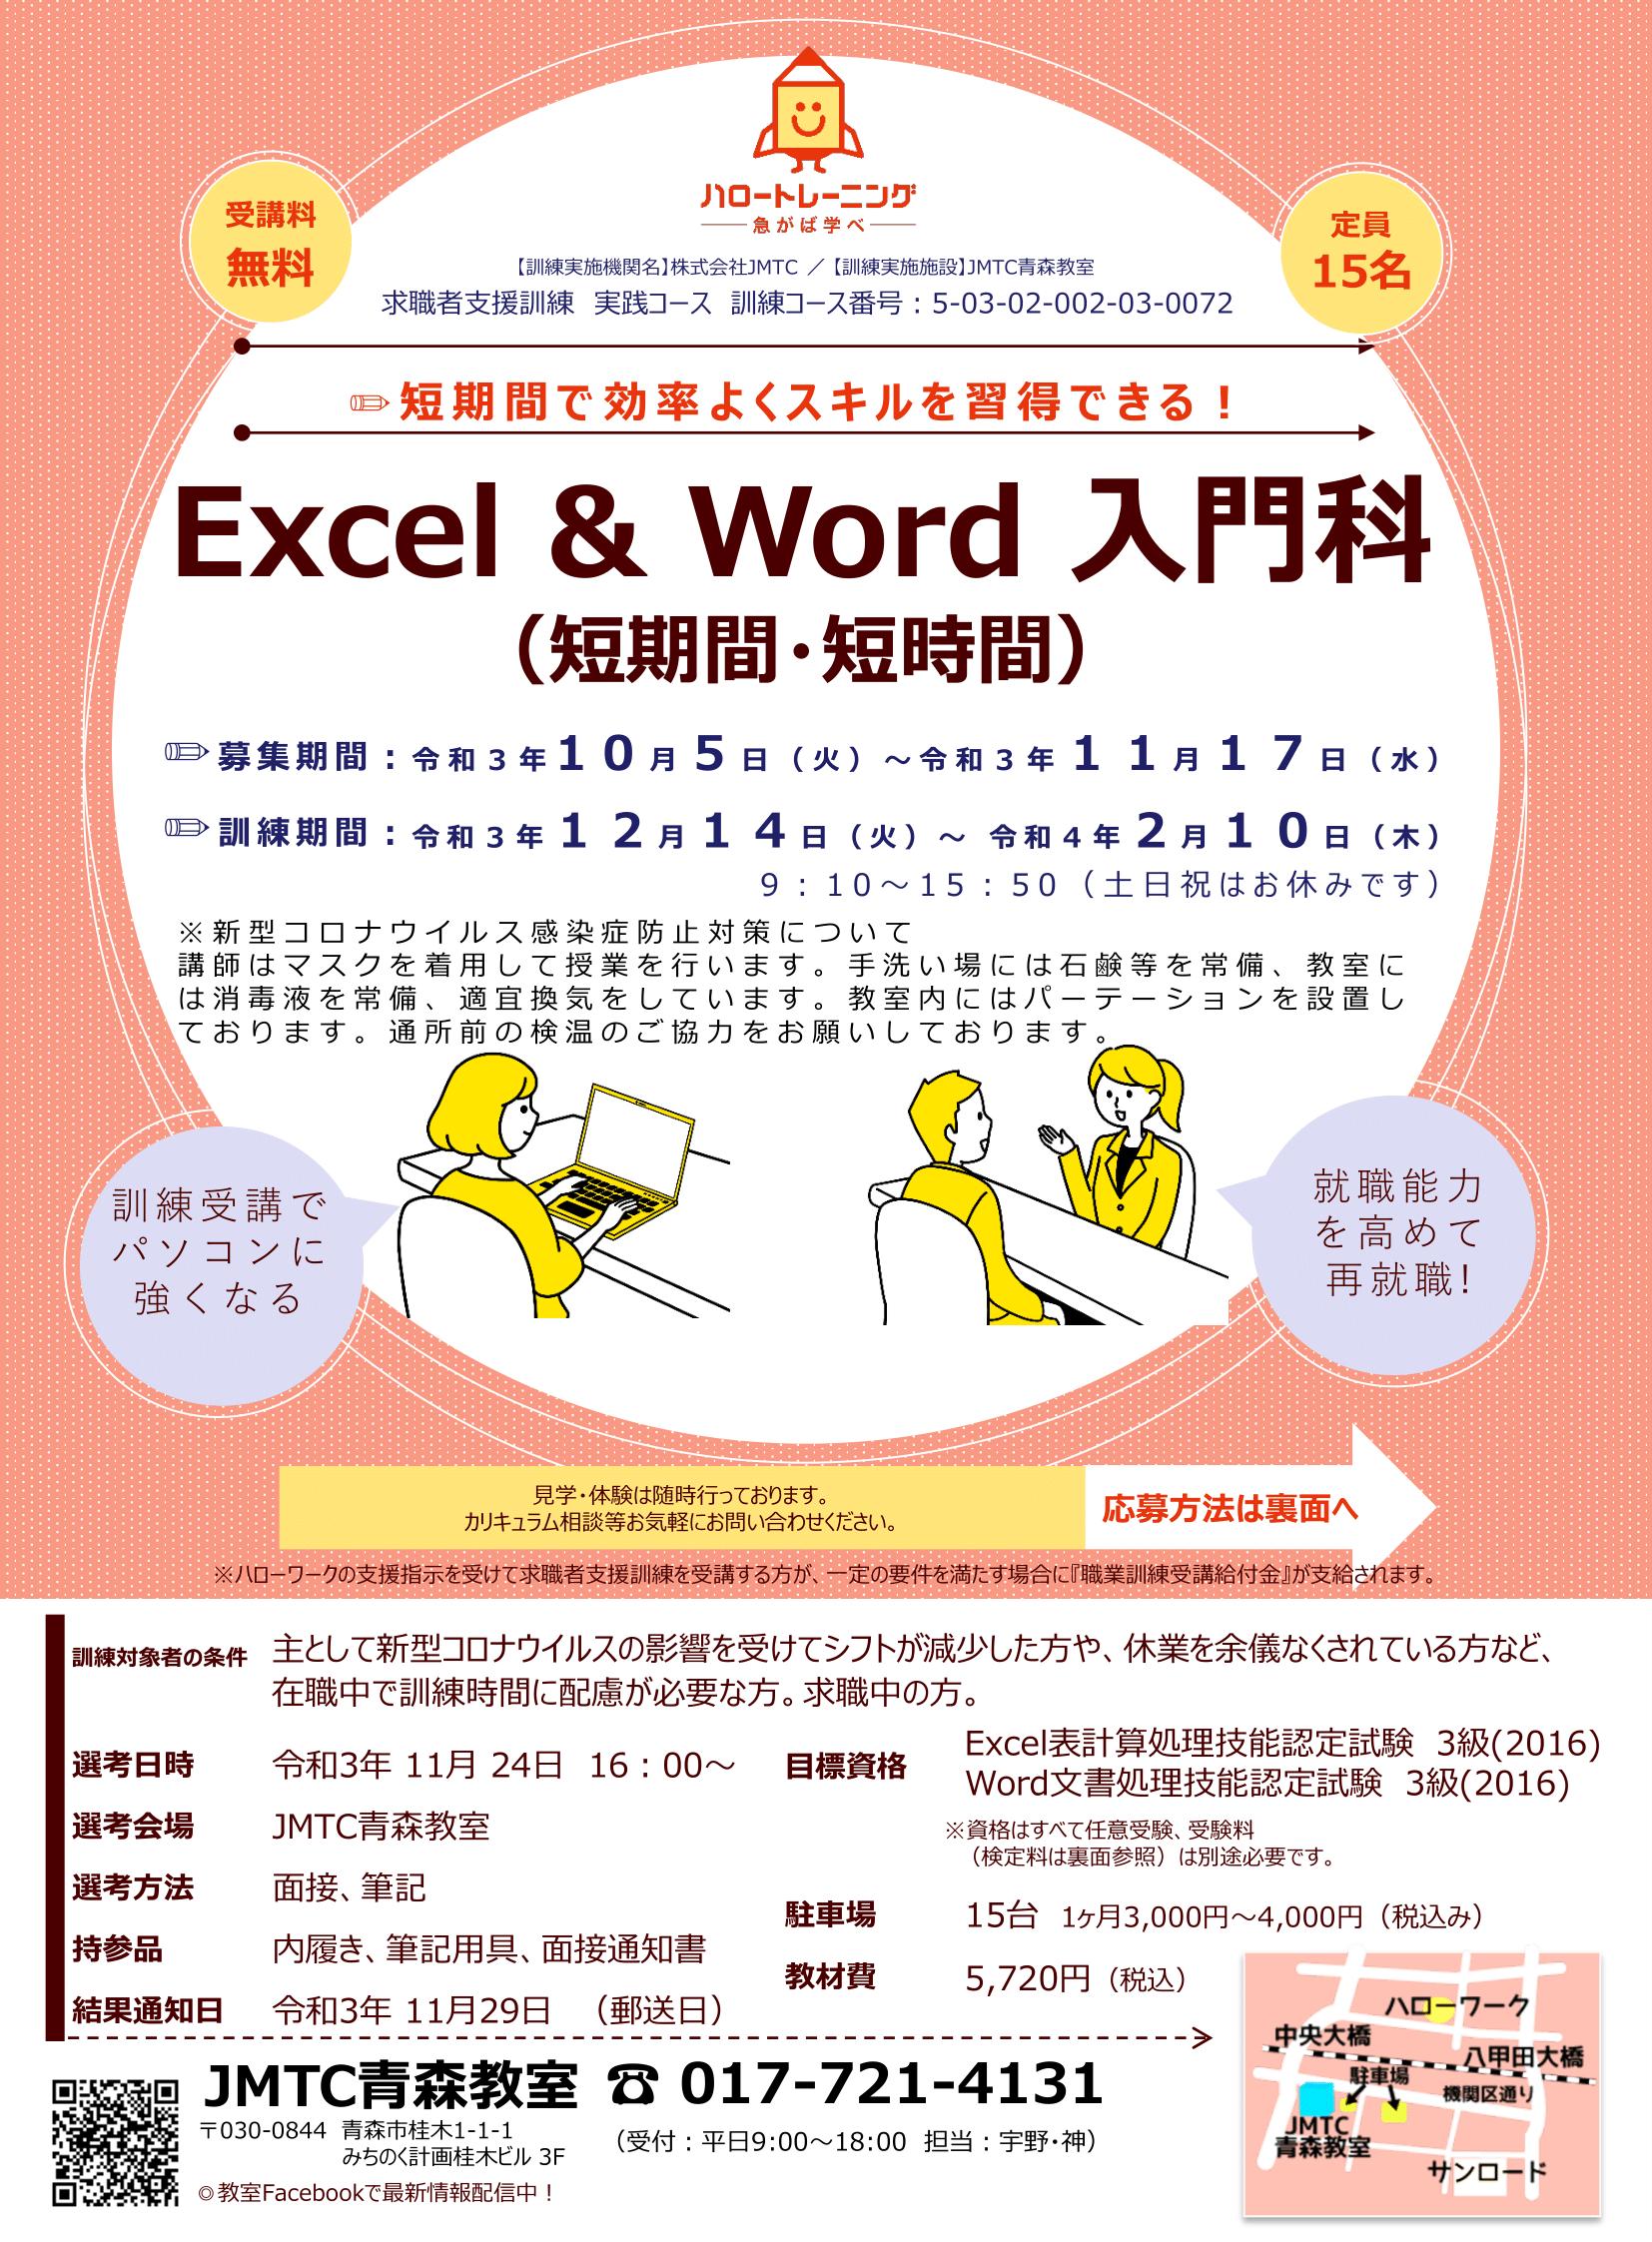 JMTC青森教室「Excel & Word入門科」